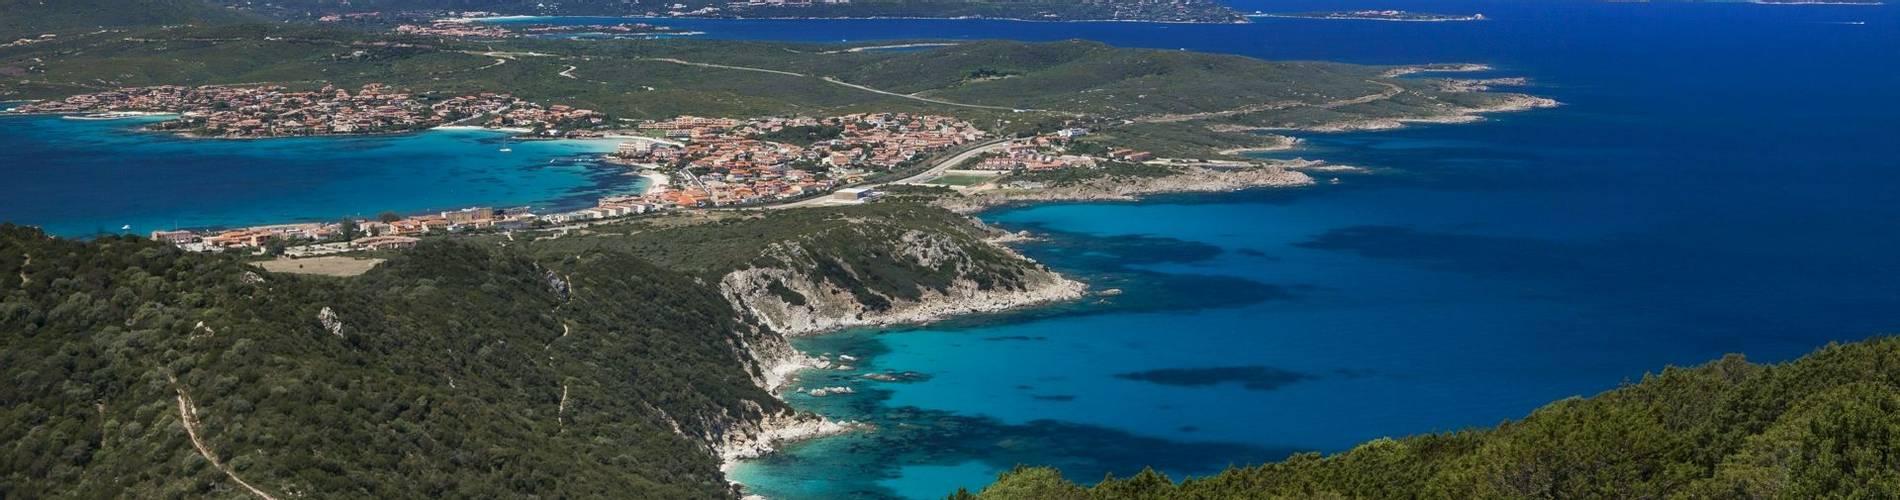 Golfo Aranci town from Capo Figari (002).jpg